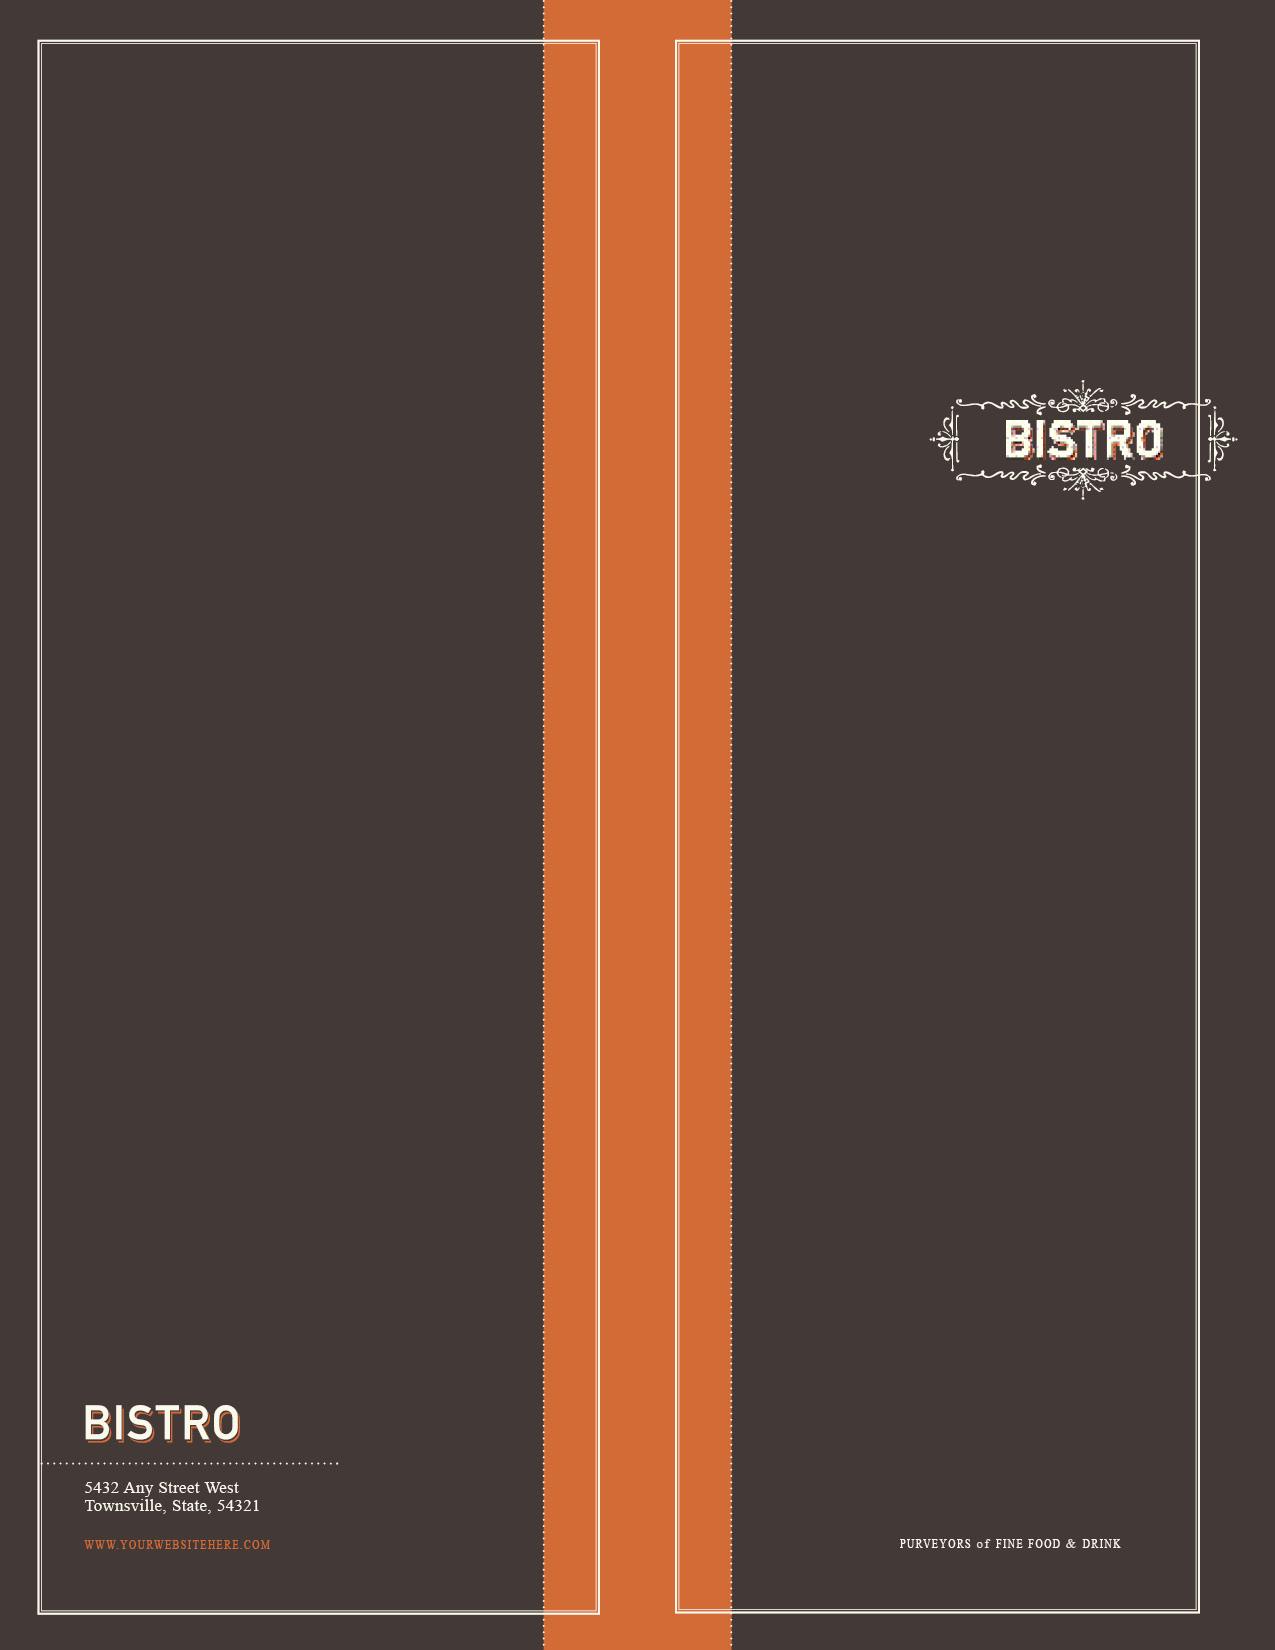 customizable every door direct mail template 10305 for food beverage bistro restaurant. Black Bedroom Furniture Sets. Home Design Ideas